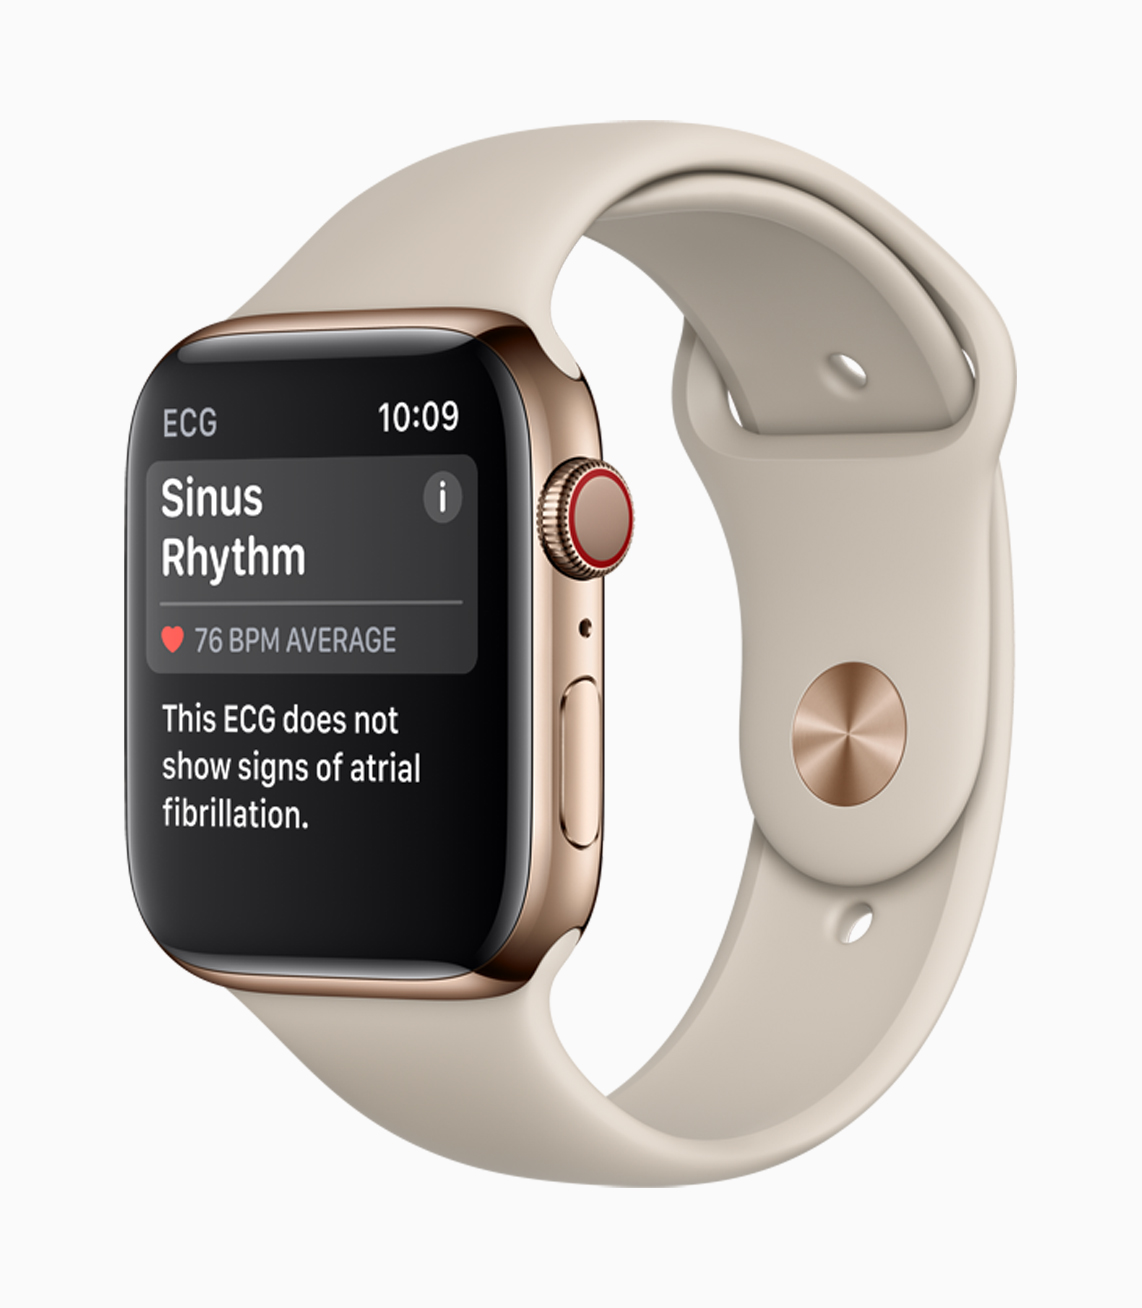 Apple Watch Series 4, Sinus Rhythm